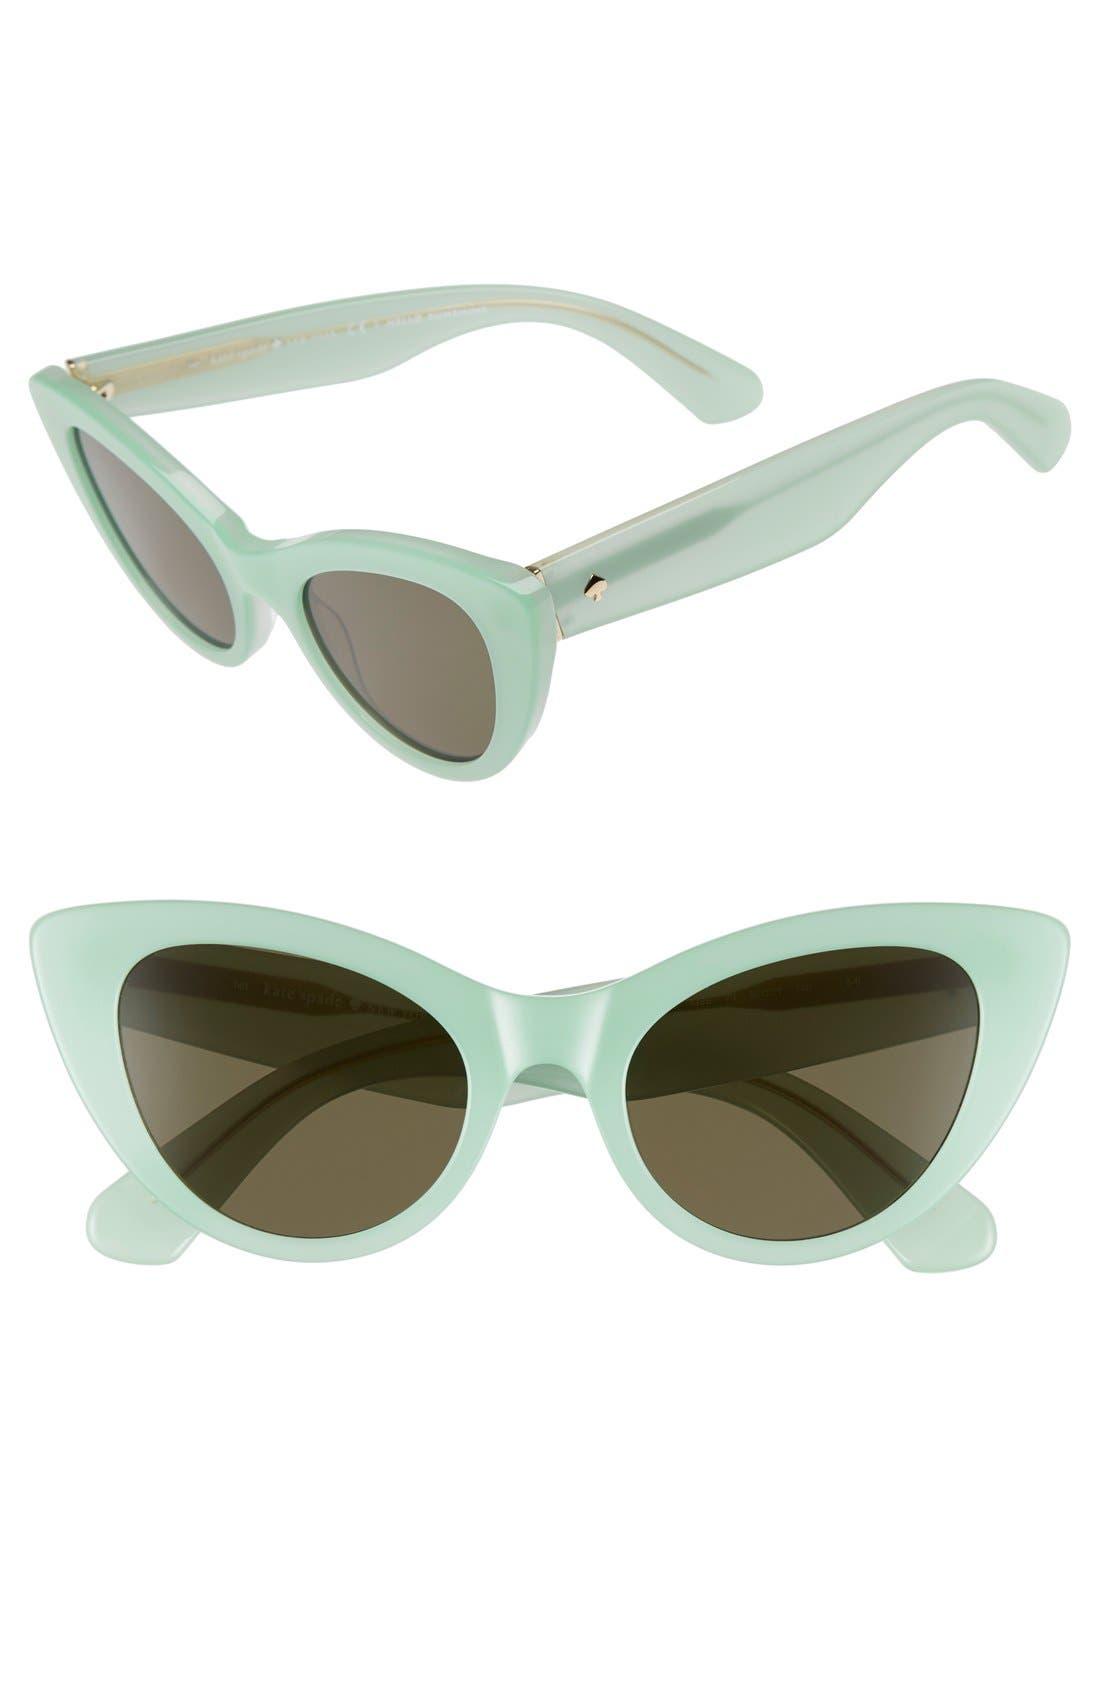 Alternate Image 1 Selected - kate spade new york 'deandra' 50mm cat eye sunglasses